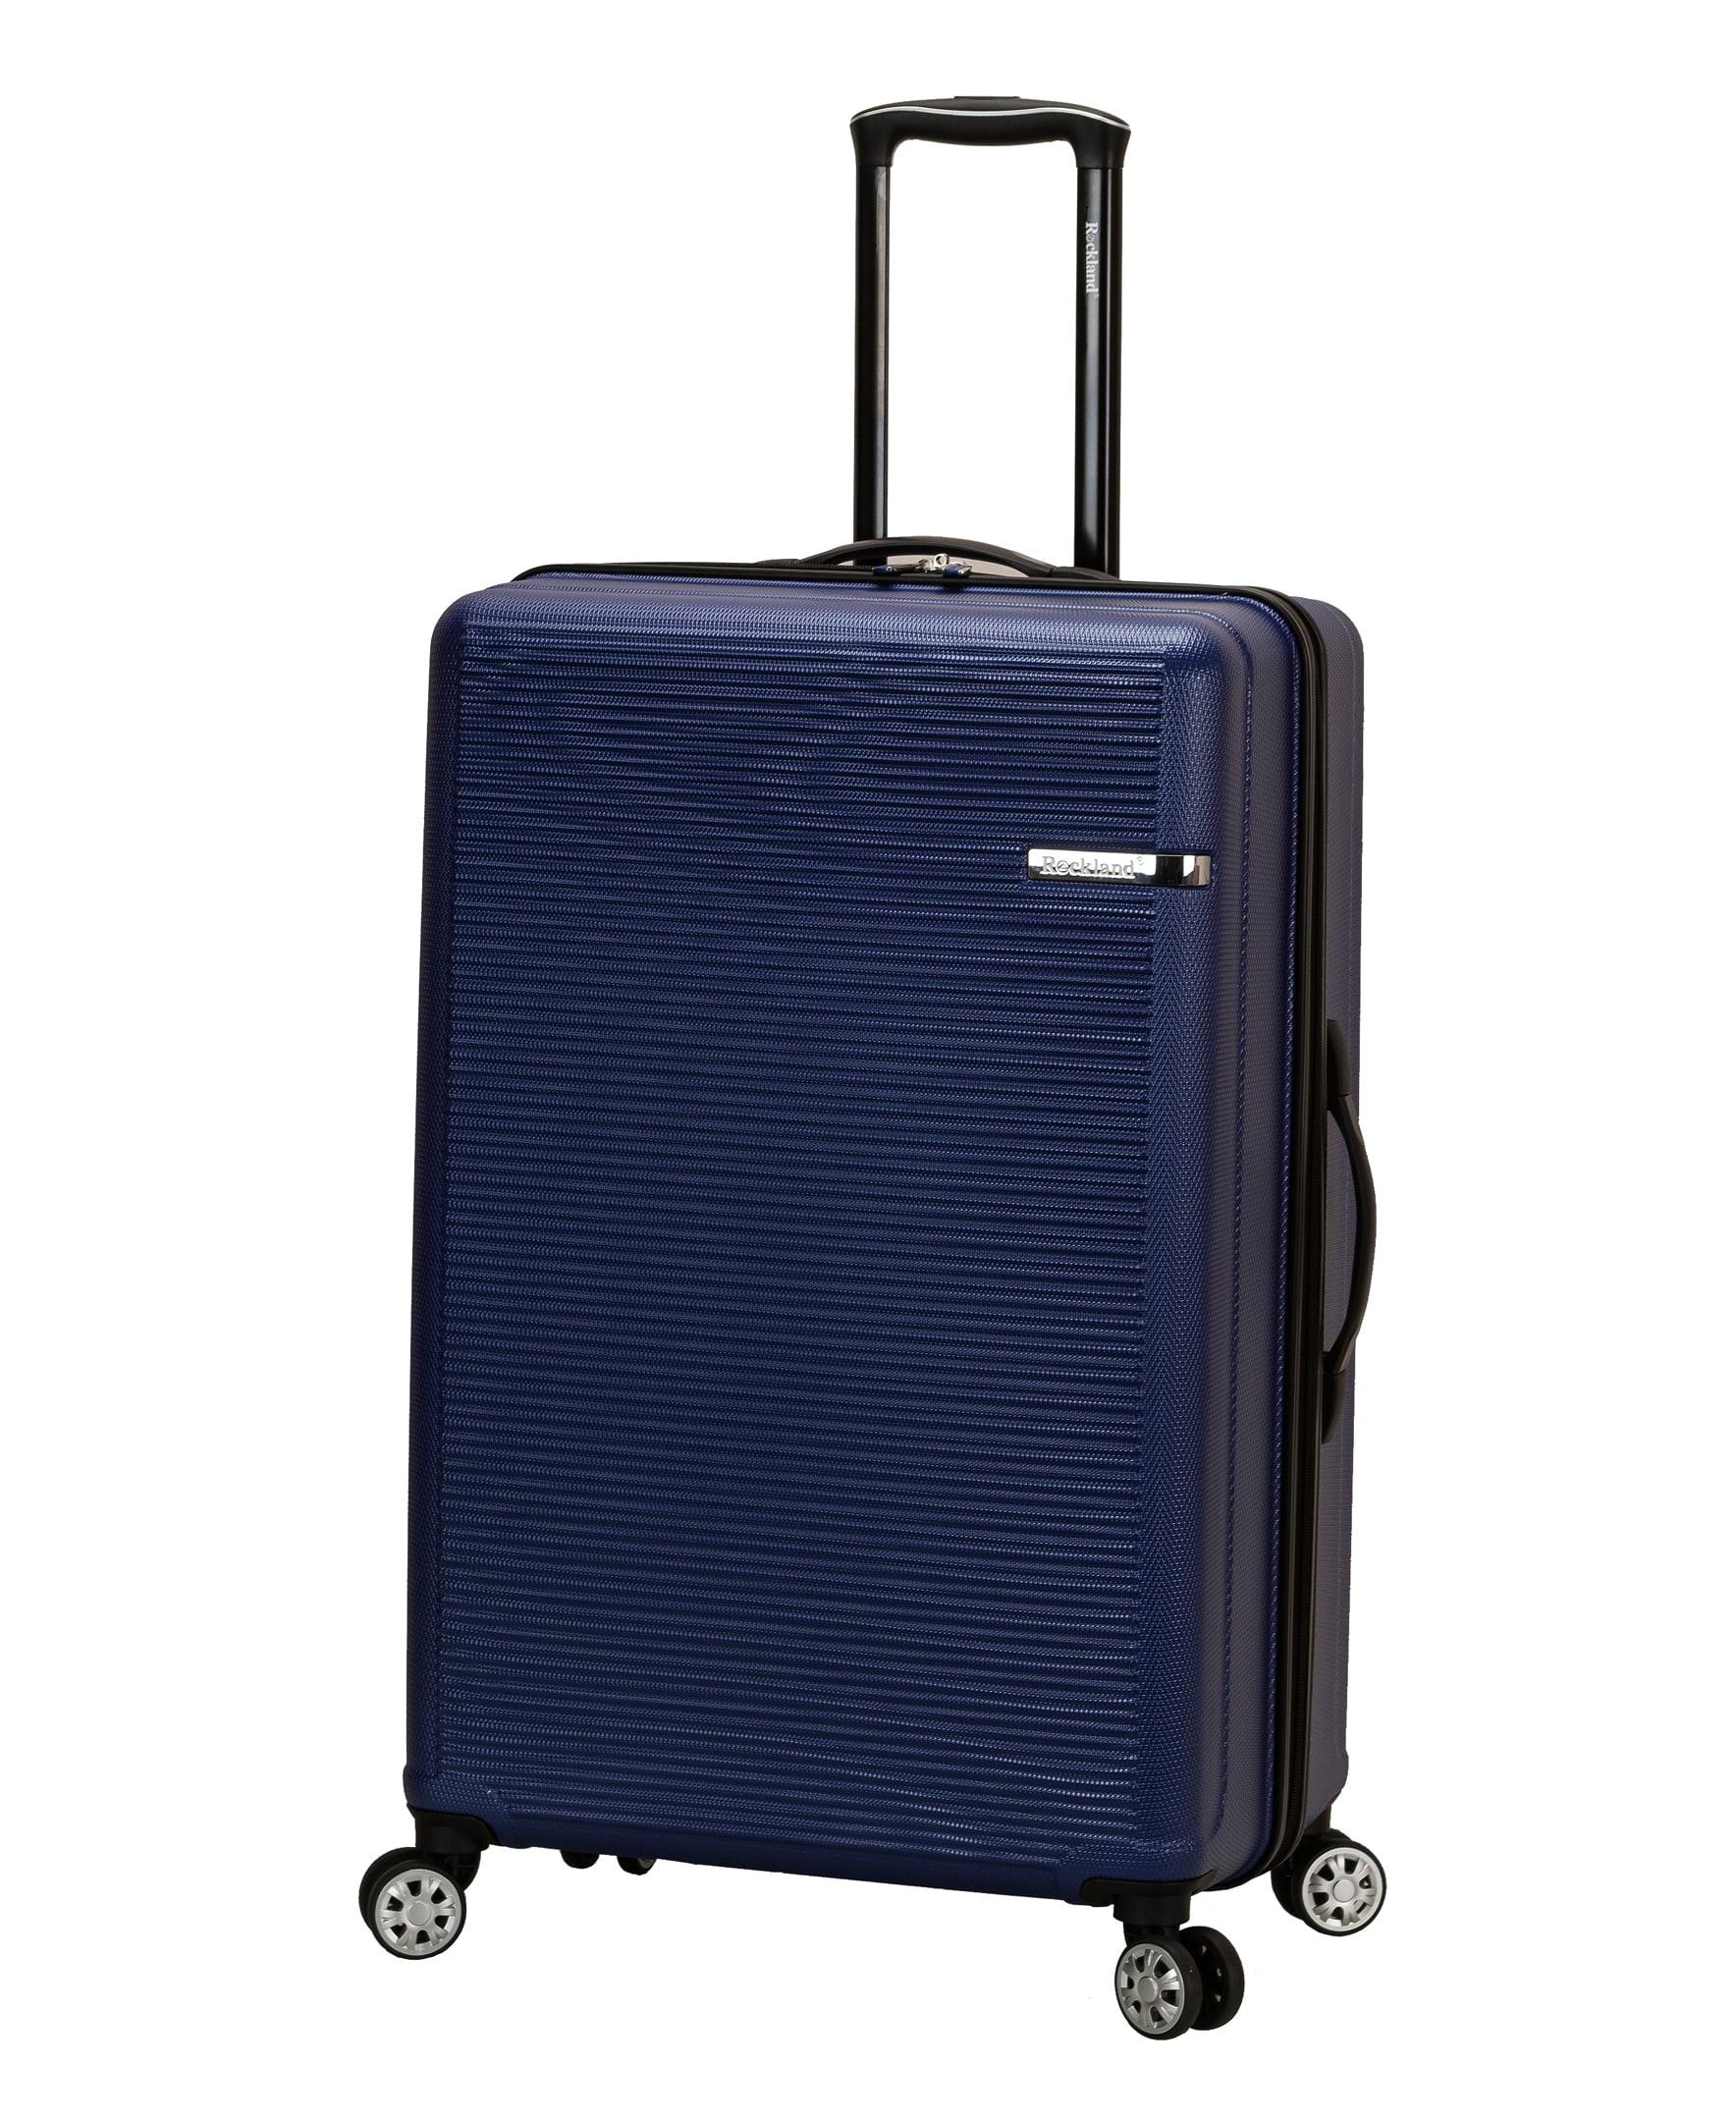 344ad2558e15 Rockland Luggage Skyline 3 Piece Hardside ABS Non-Expandable Luggage Set,  F240